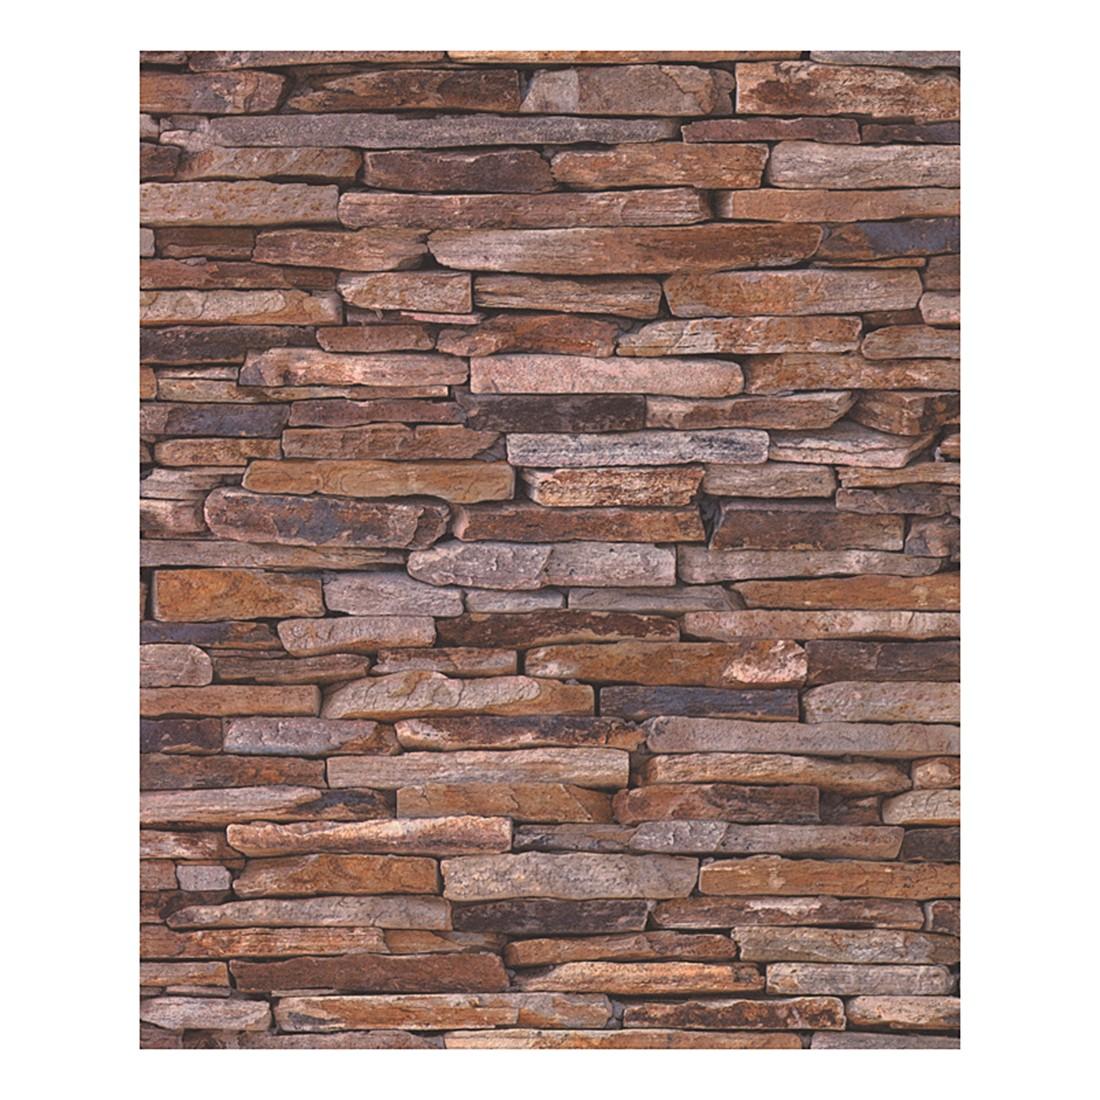 Tapete wood and stone beige braun glatt fein for Fein bad braun